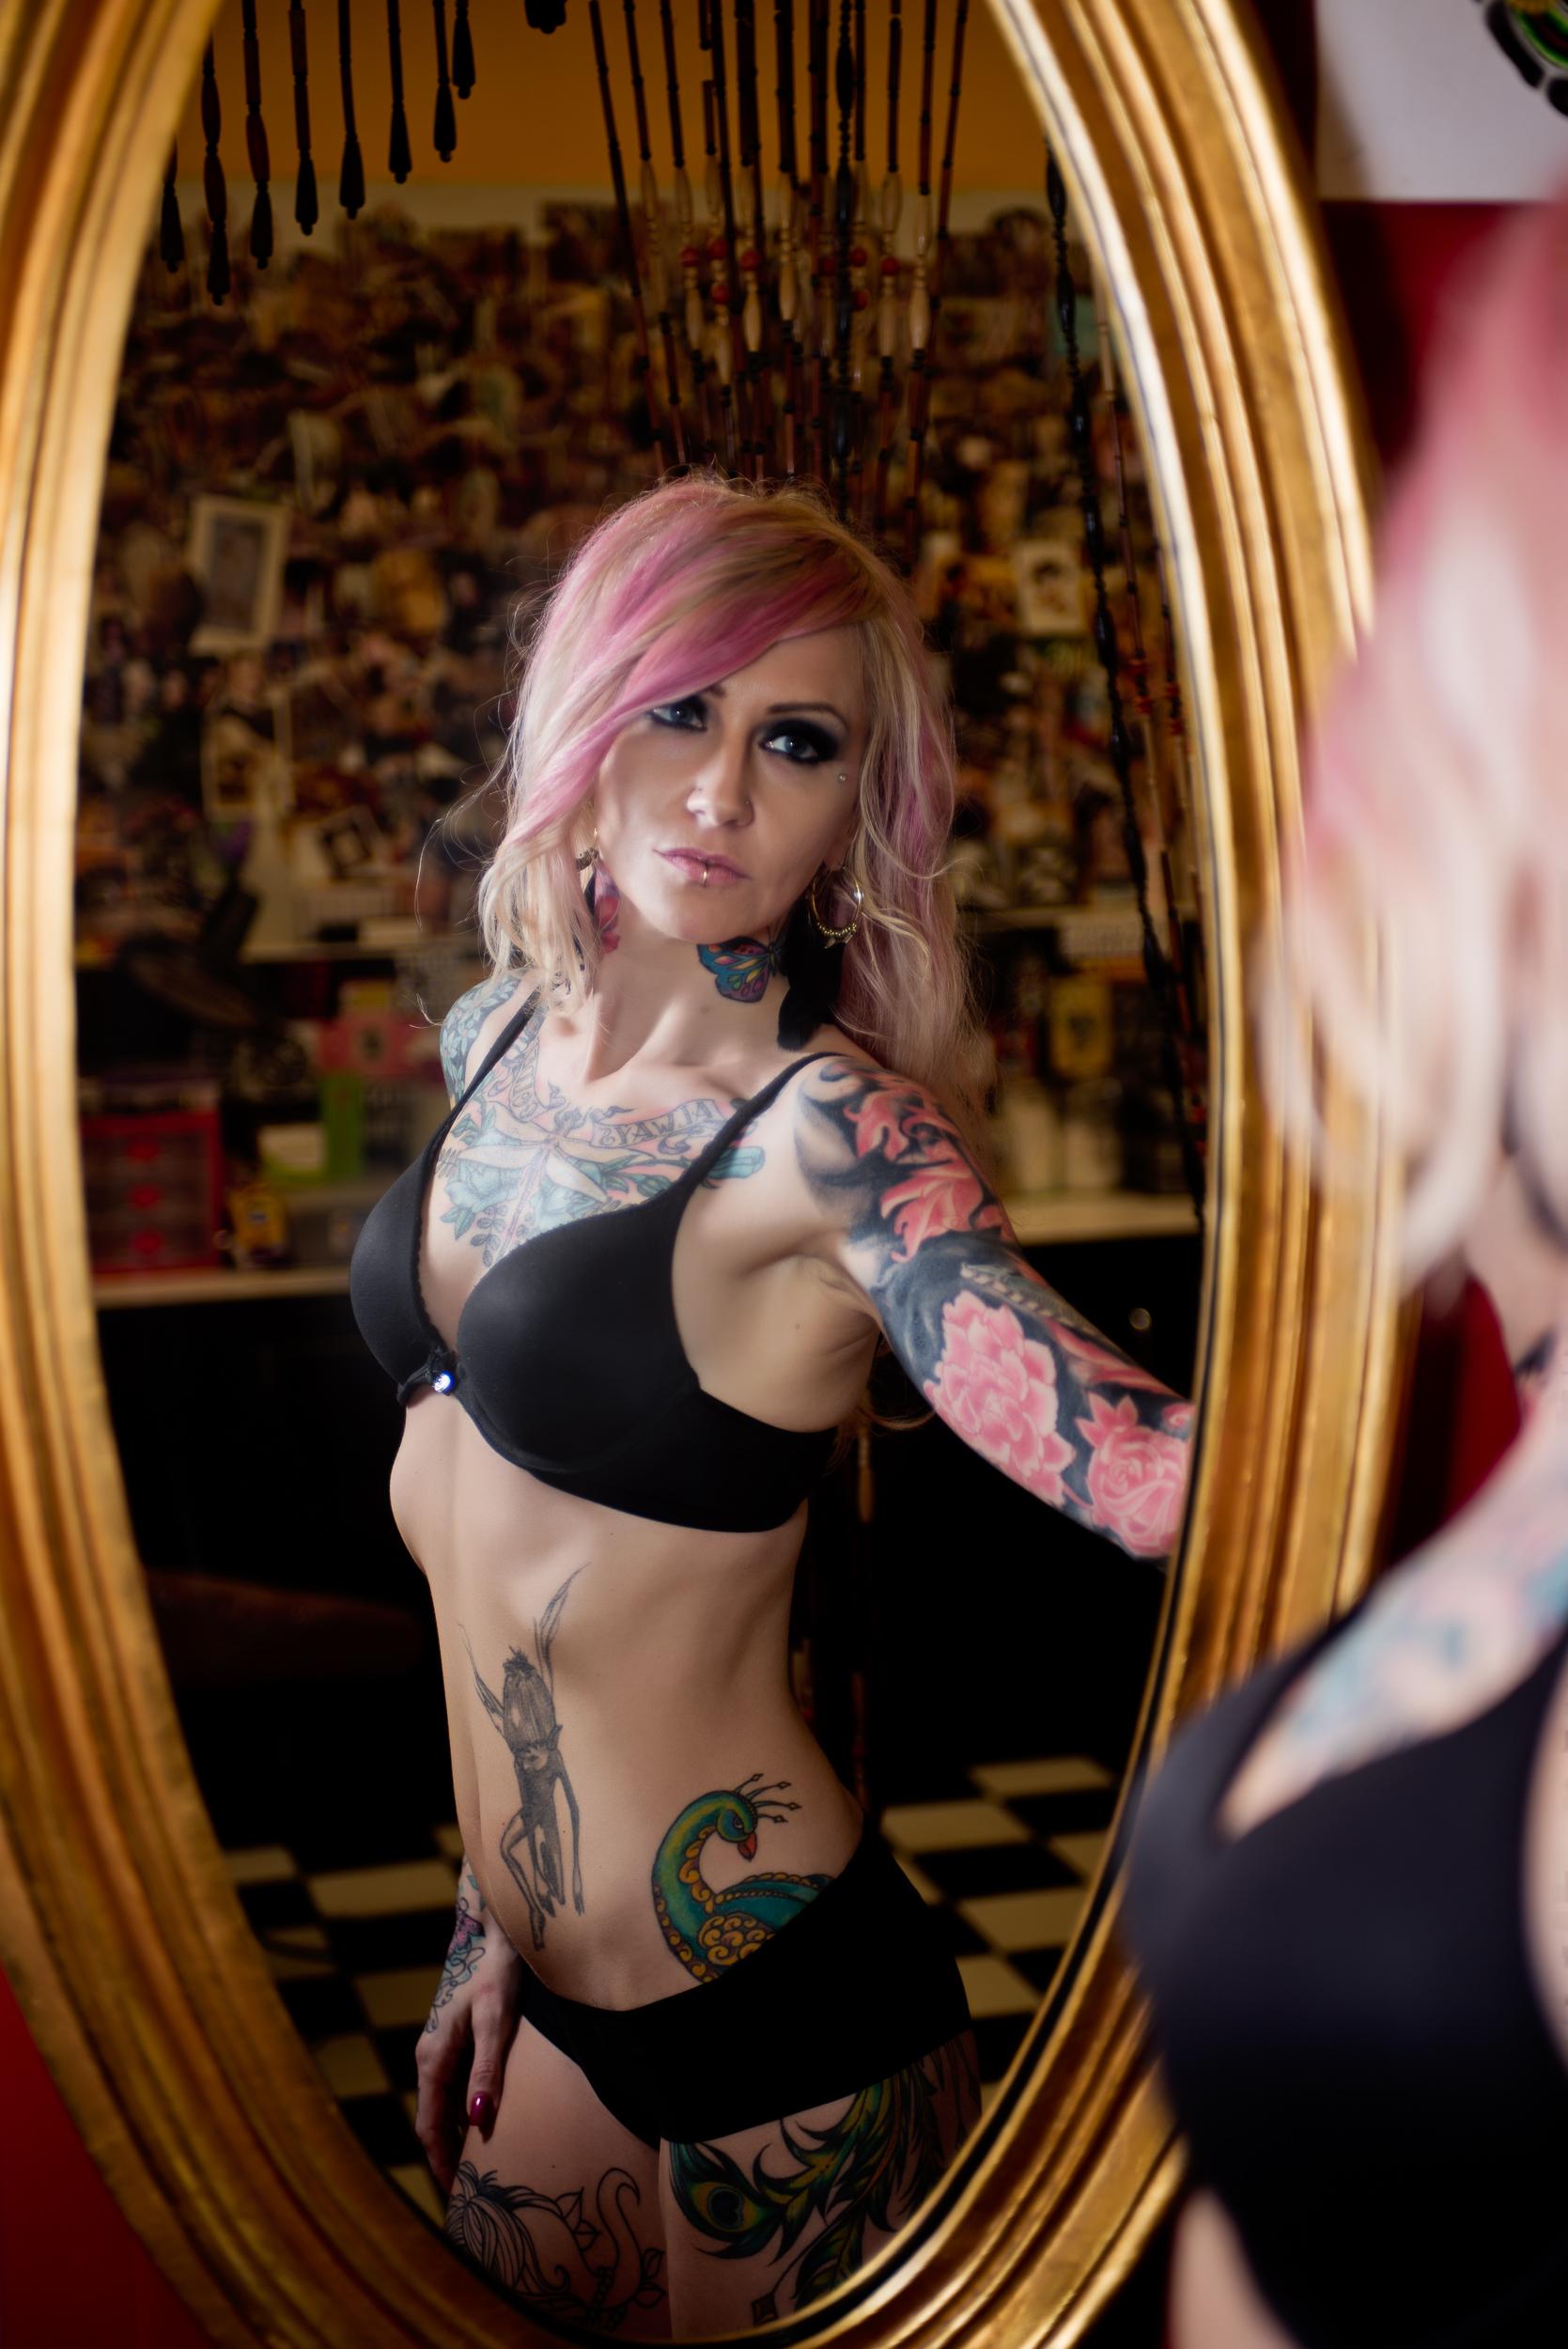 long-island-commercial-editorial-portrait-photographer-flash-photography-digital-tattoo-model-mirror.jpg